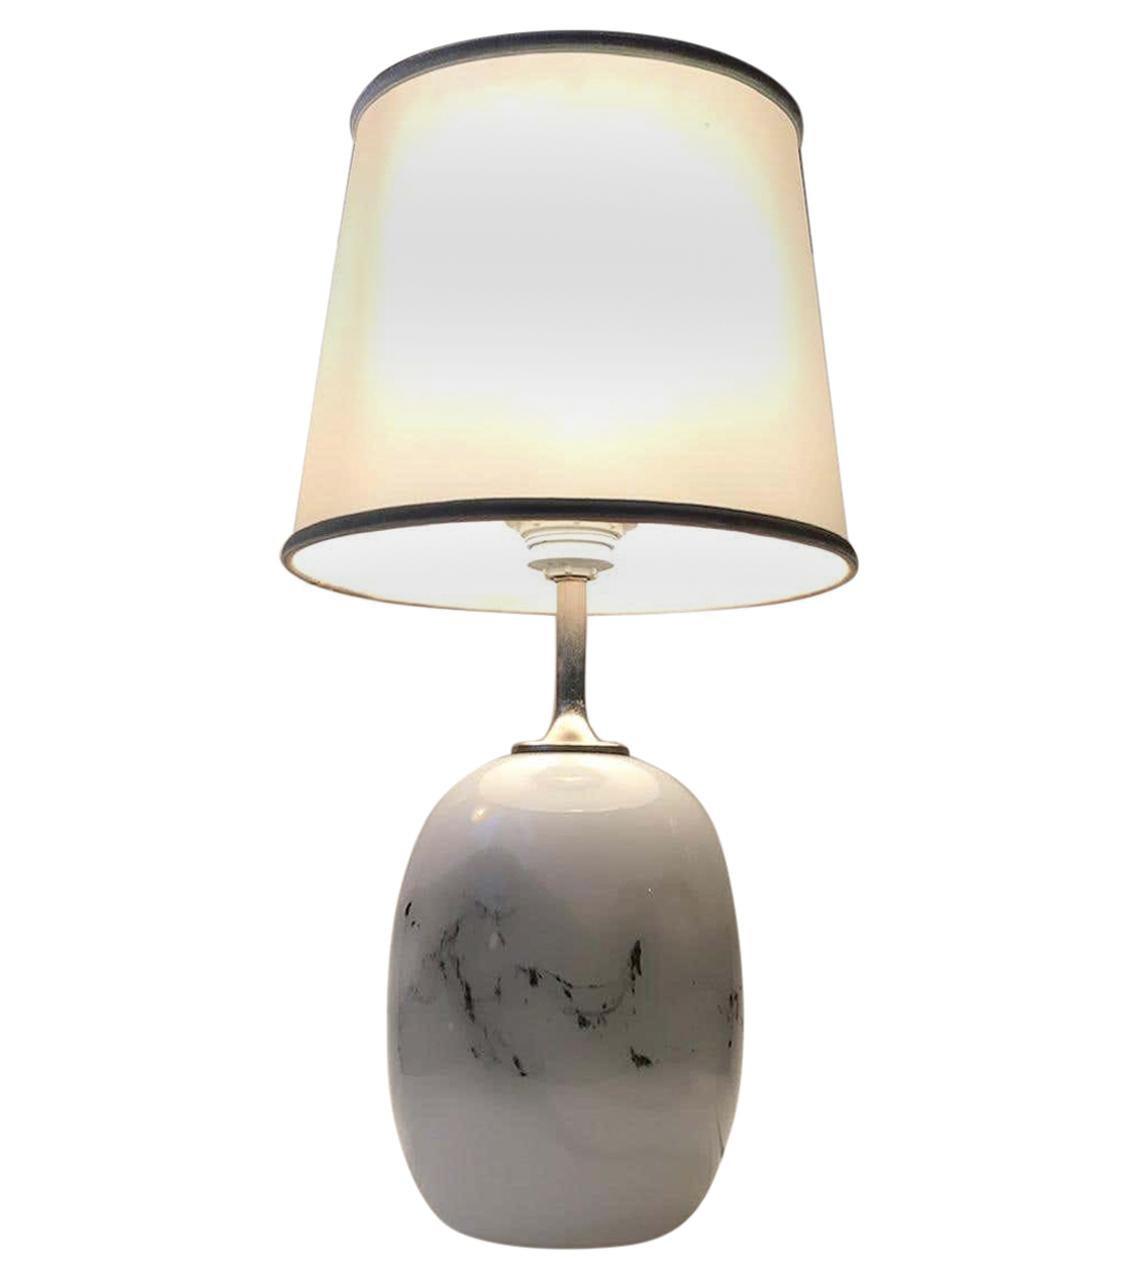 Holmegaard Art Glass Sakura Table Lamp by Michael Bang, 1970s